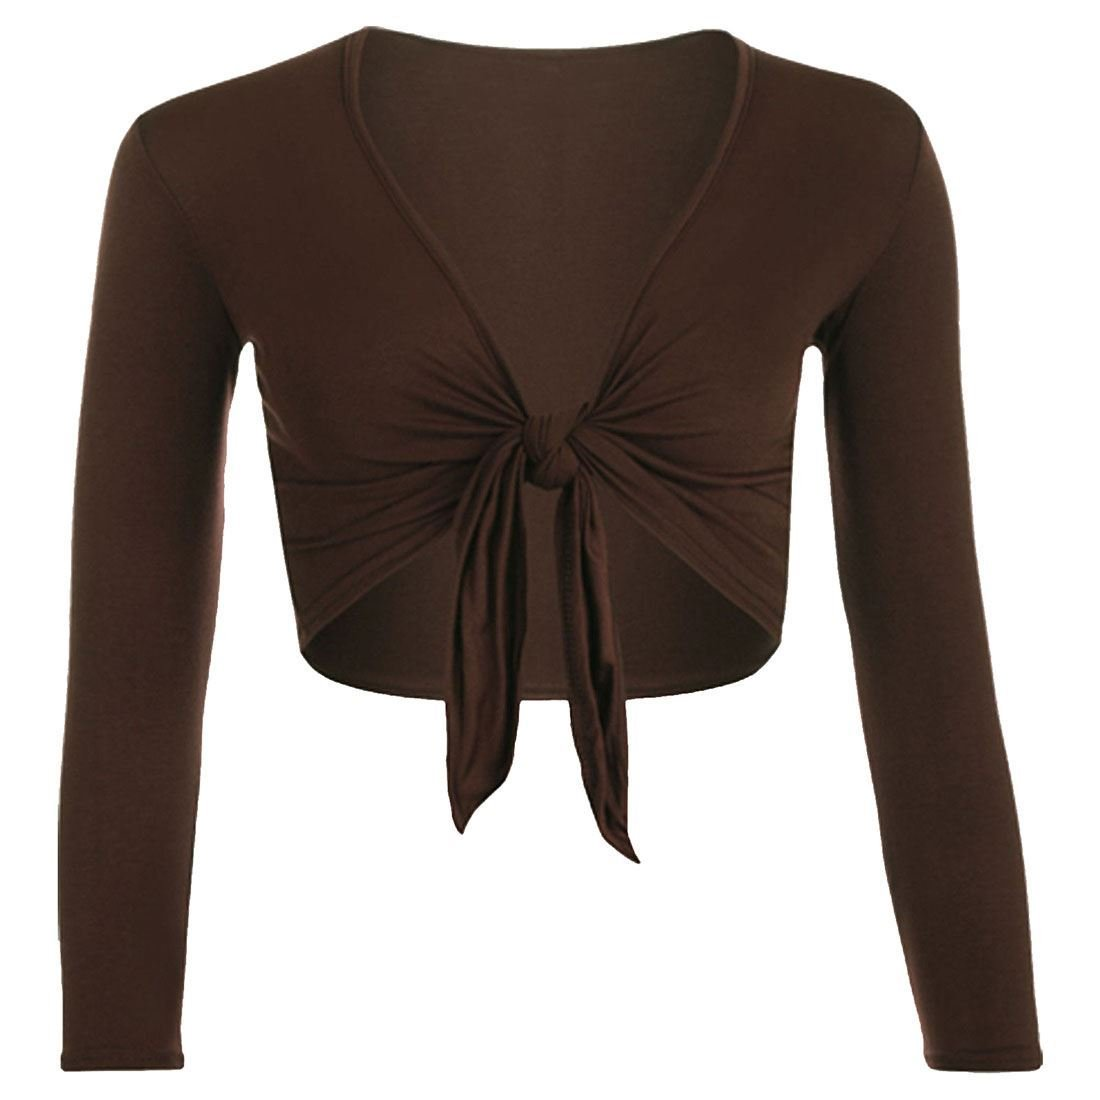 Purple Hanger Women's Long Sleeve Bolero Crop Cardigan Tie Shrug Dark brown 8-10